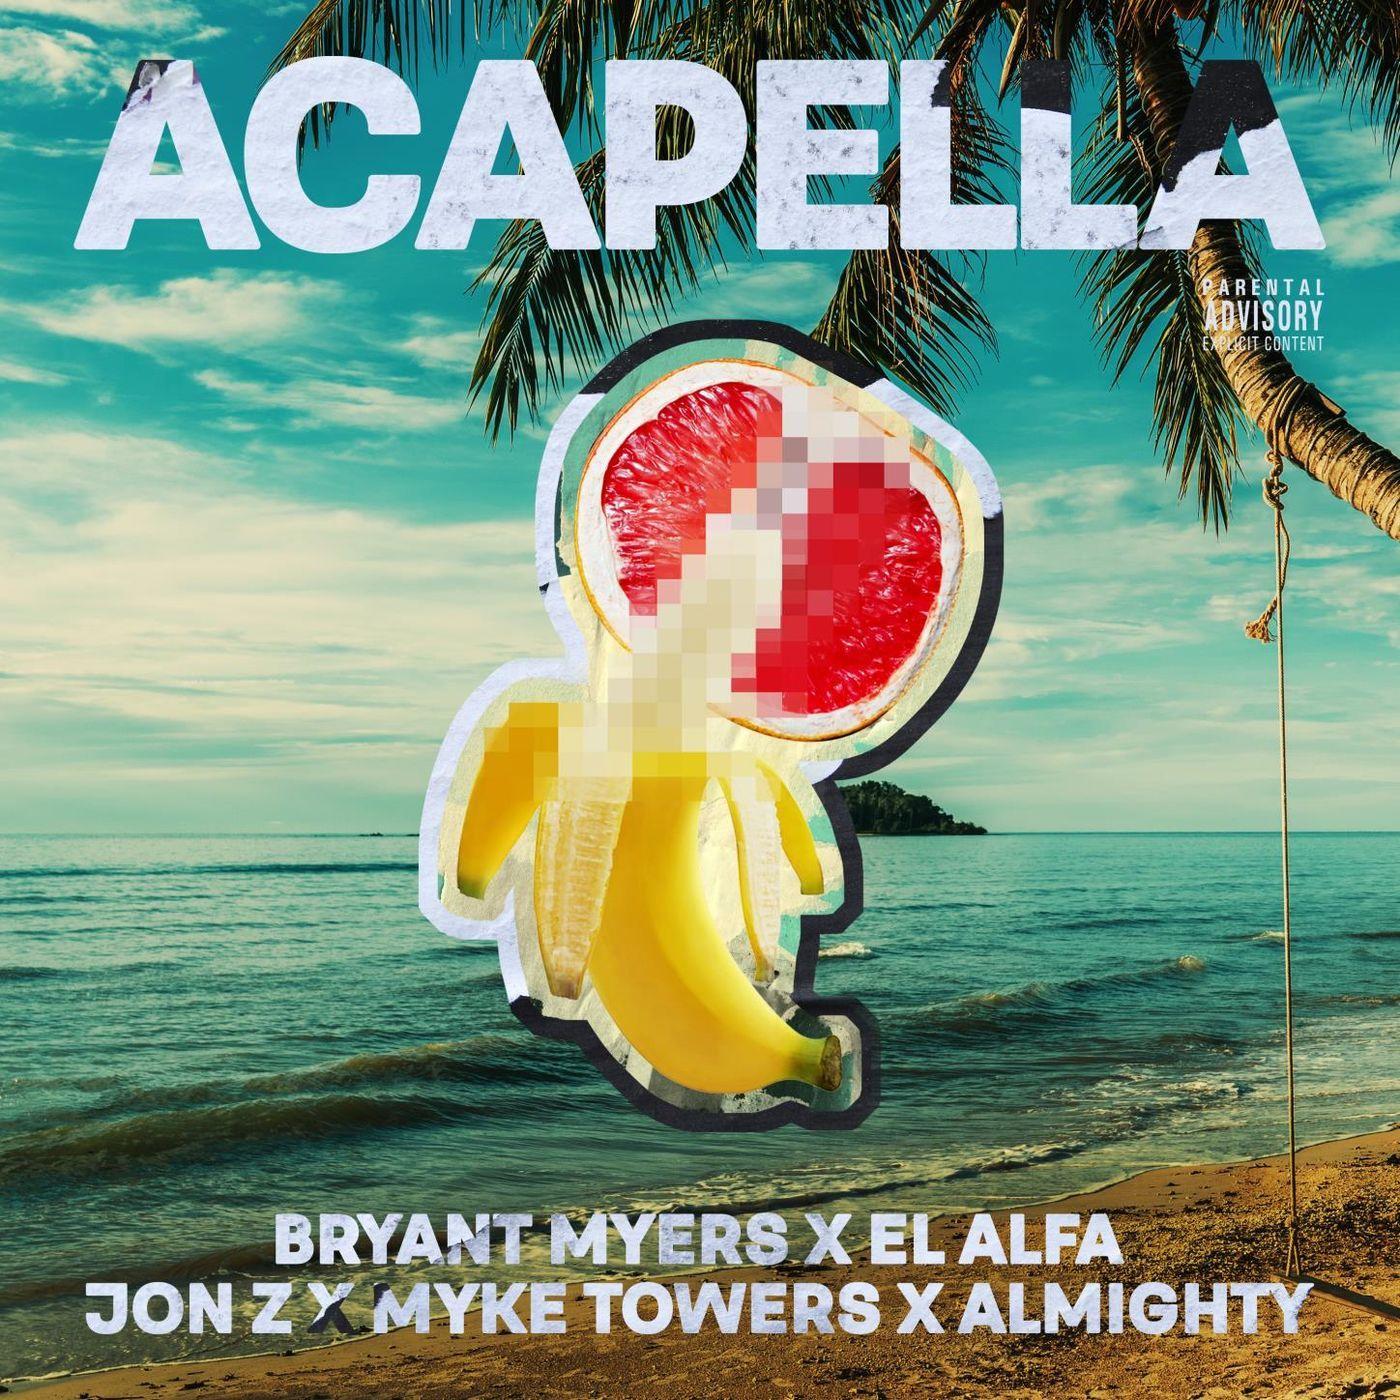 Acapella by Bryant Myers, El Alfa, Jon Z, Myke Towers & Almighty